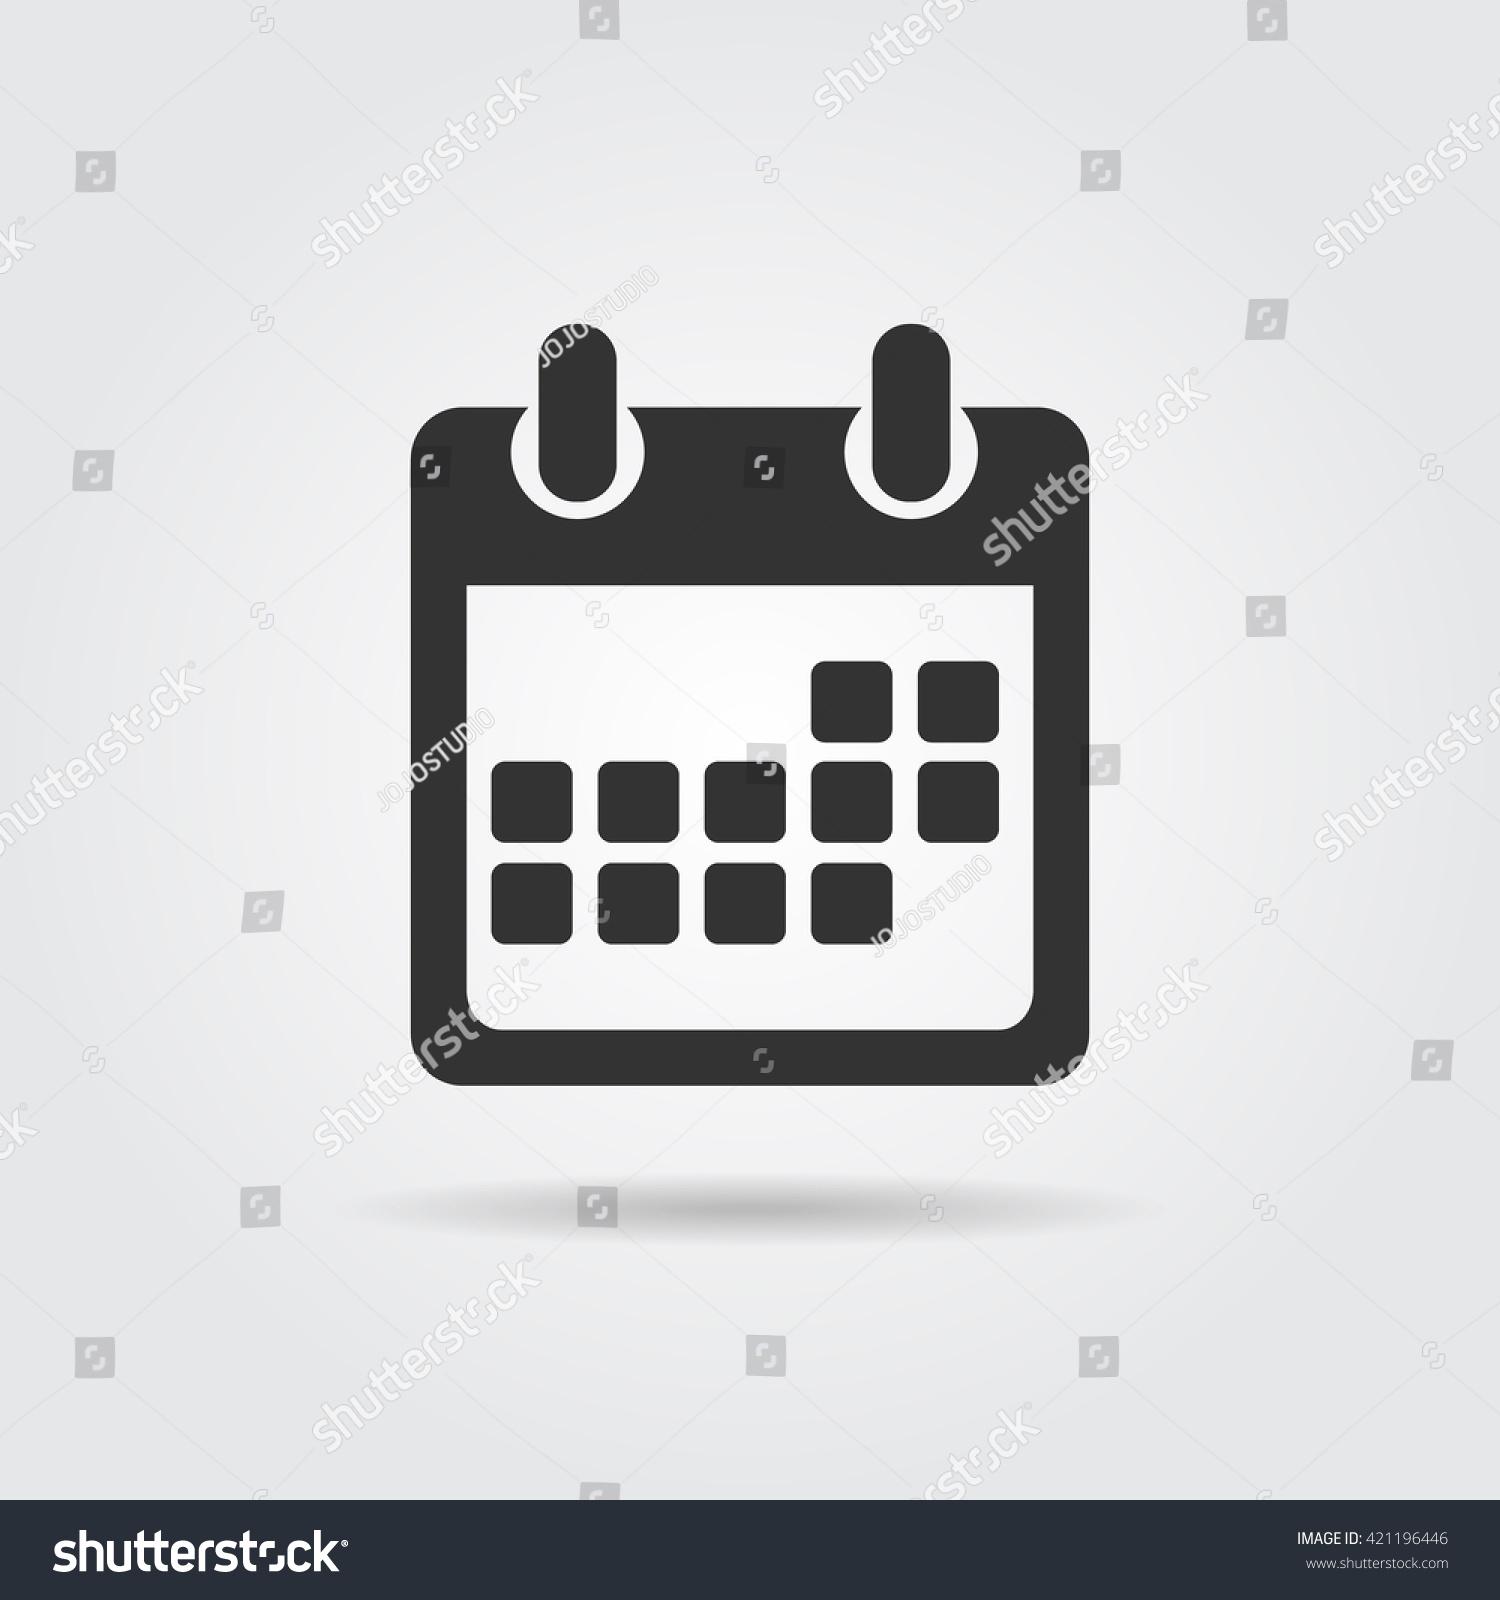 Calendar Flat Illustration : Calendar icon flat design vector illustration